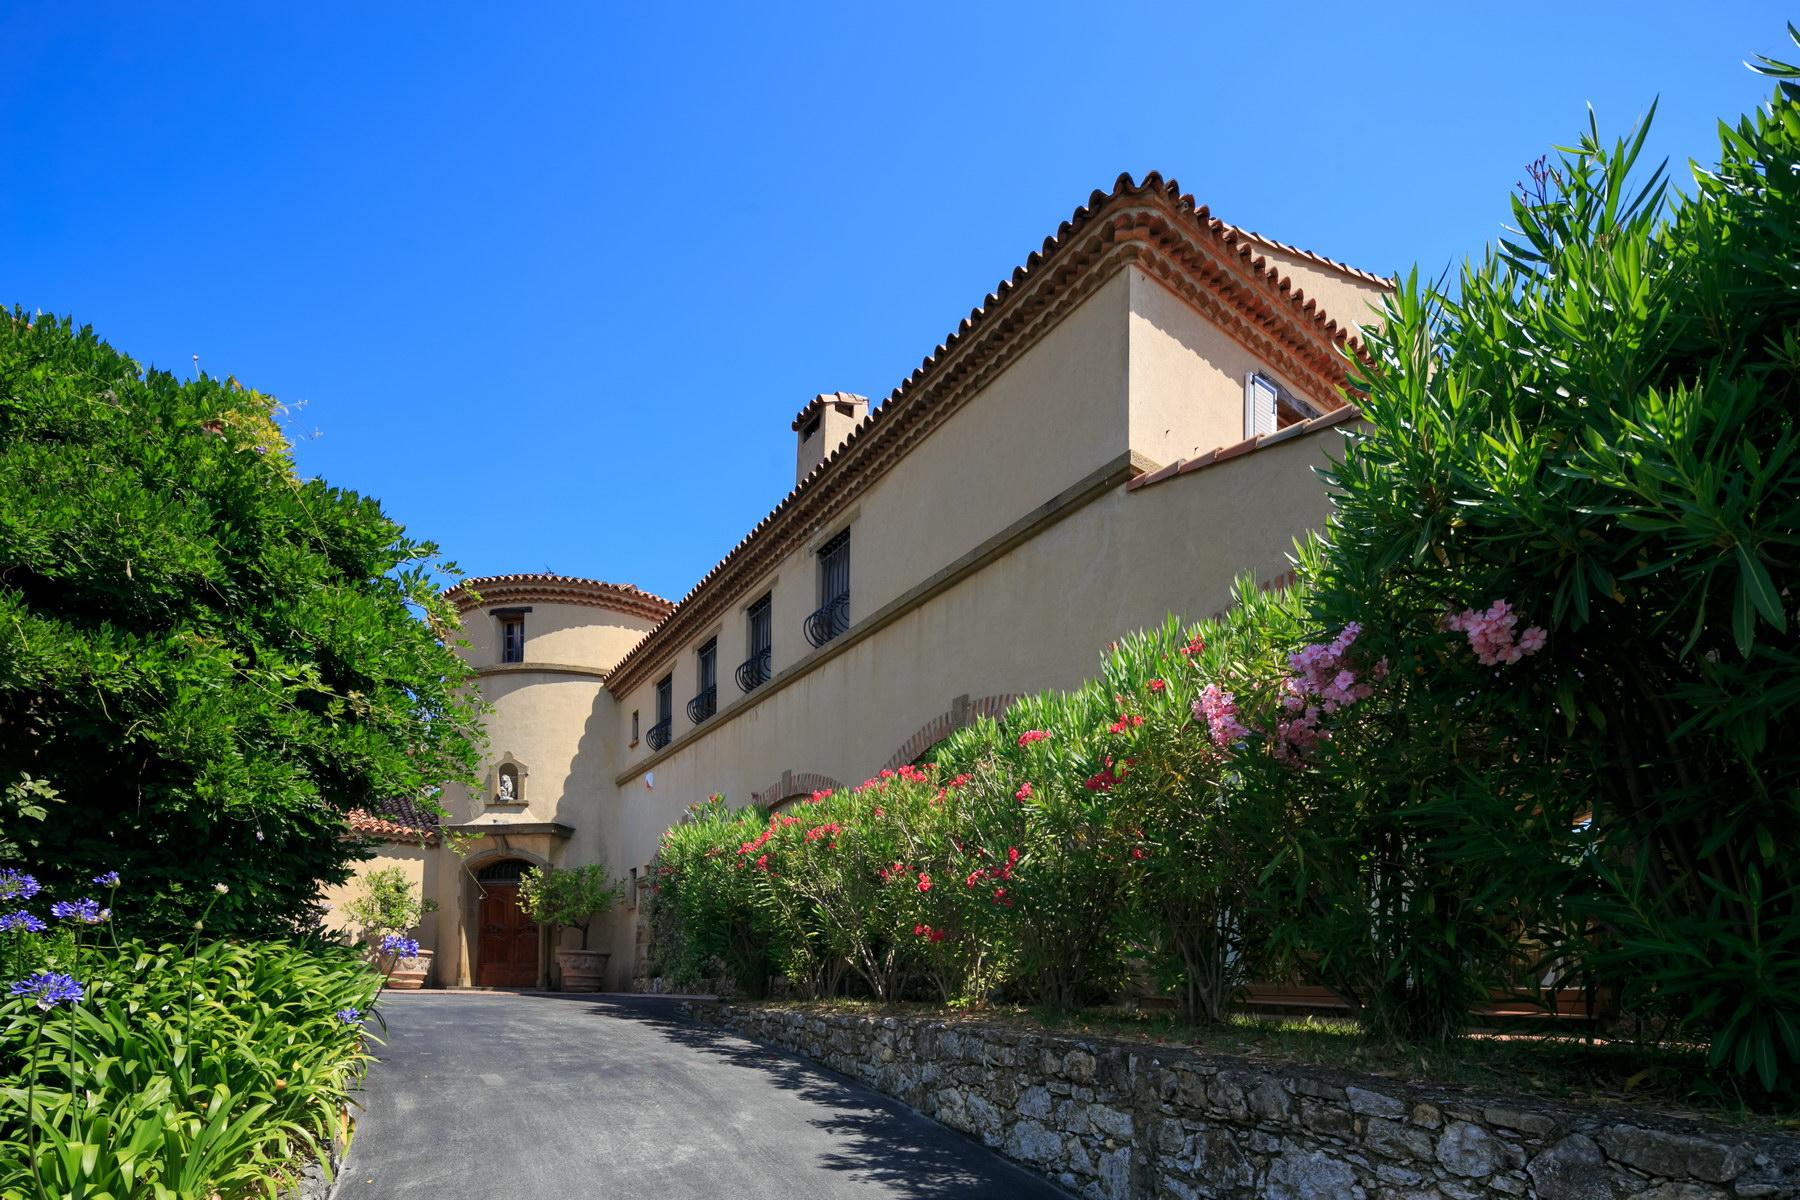 Villa in Vendita a Lerici: 5 locali, 620 mq - Foto 3